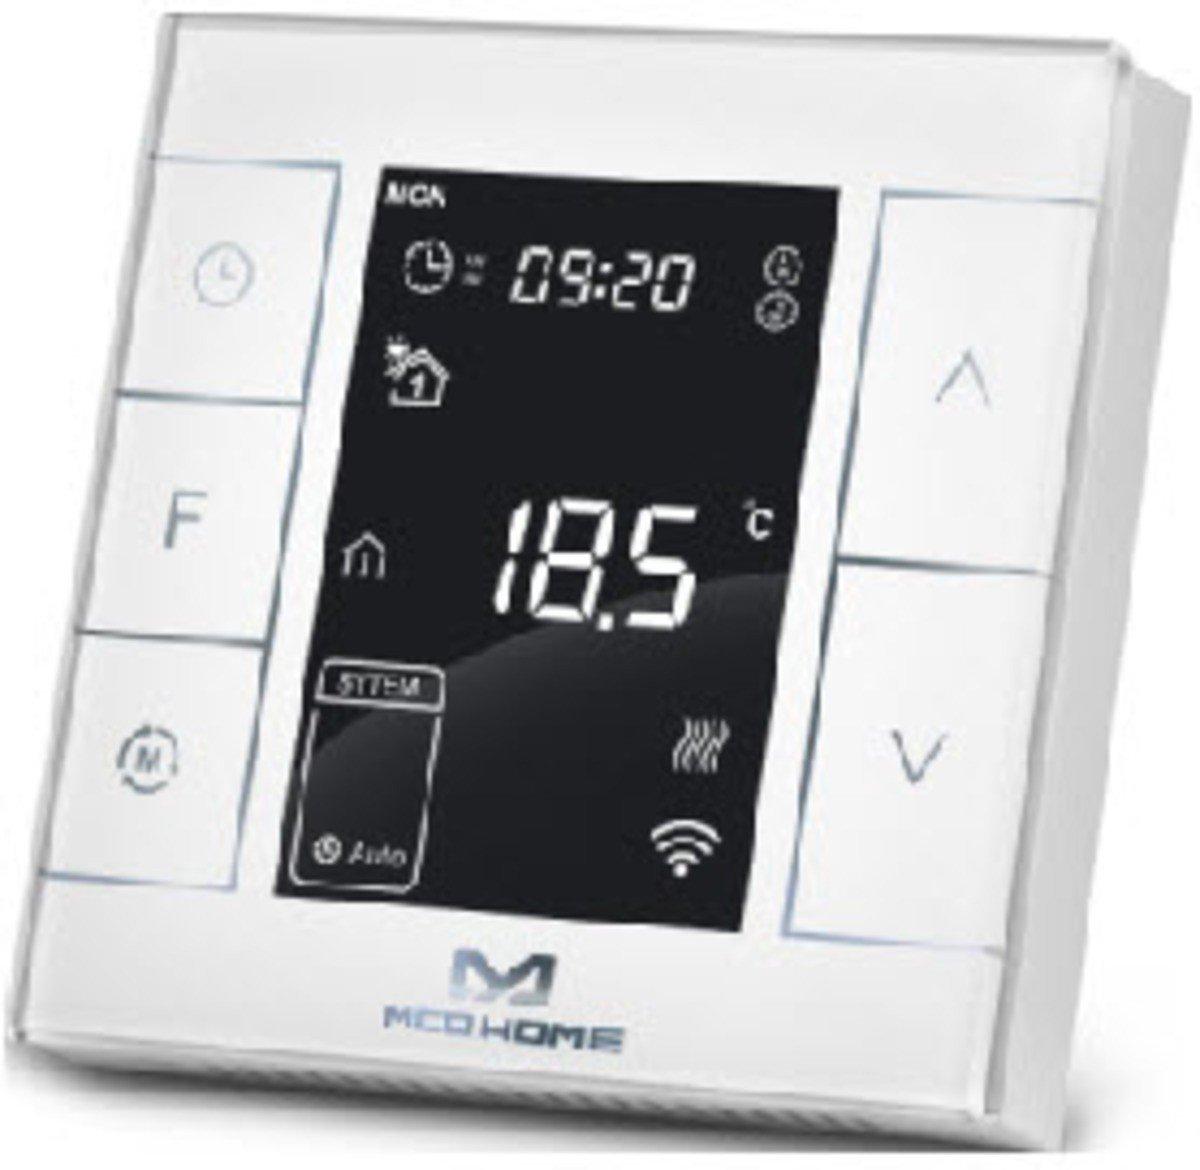 Mco Home Termostato MH7 para calefacción eléctrico: Amazon.es: Iluminación